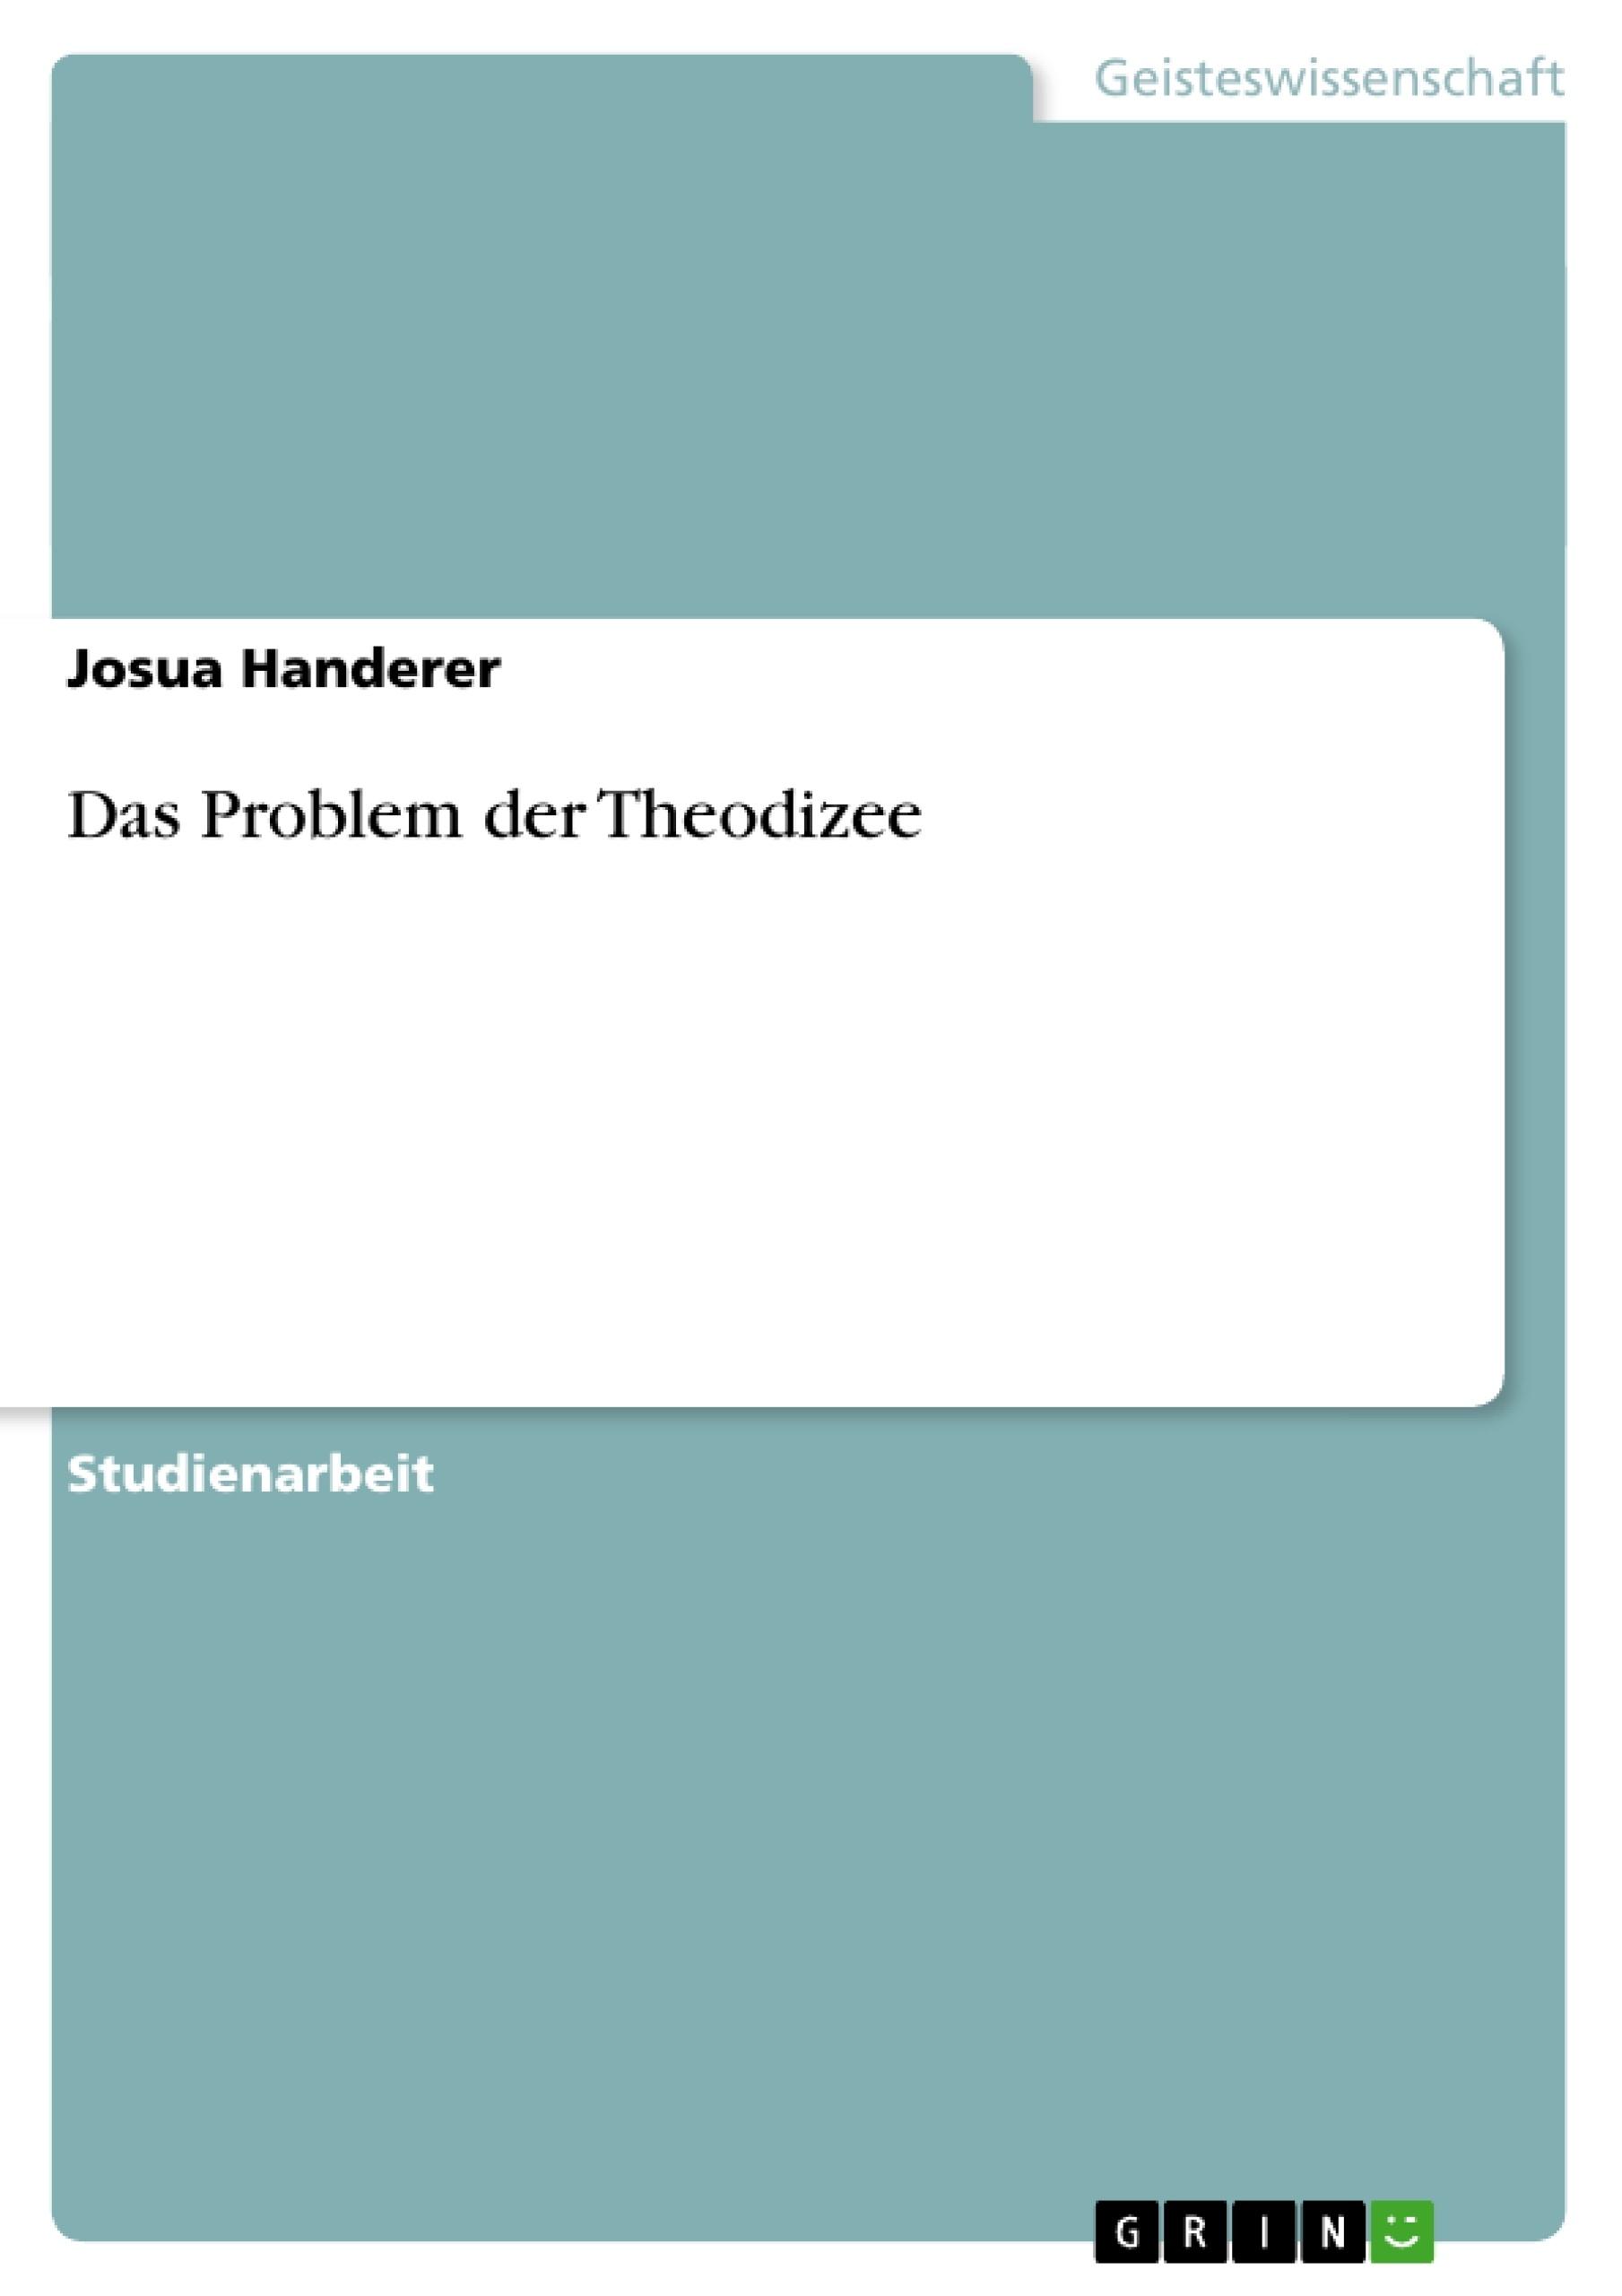 Titel: Das Problem der Theodizee